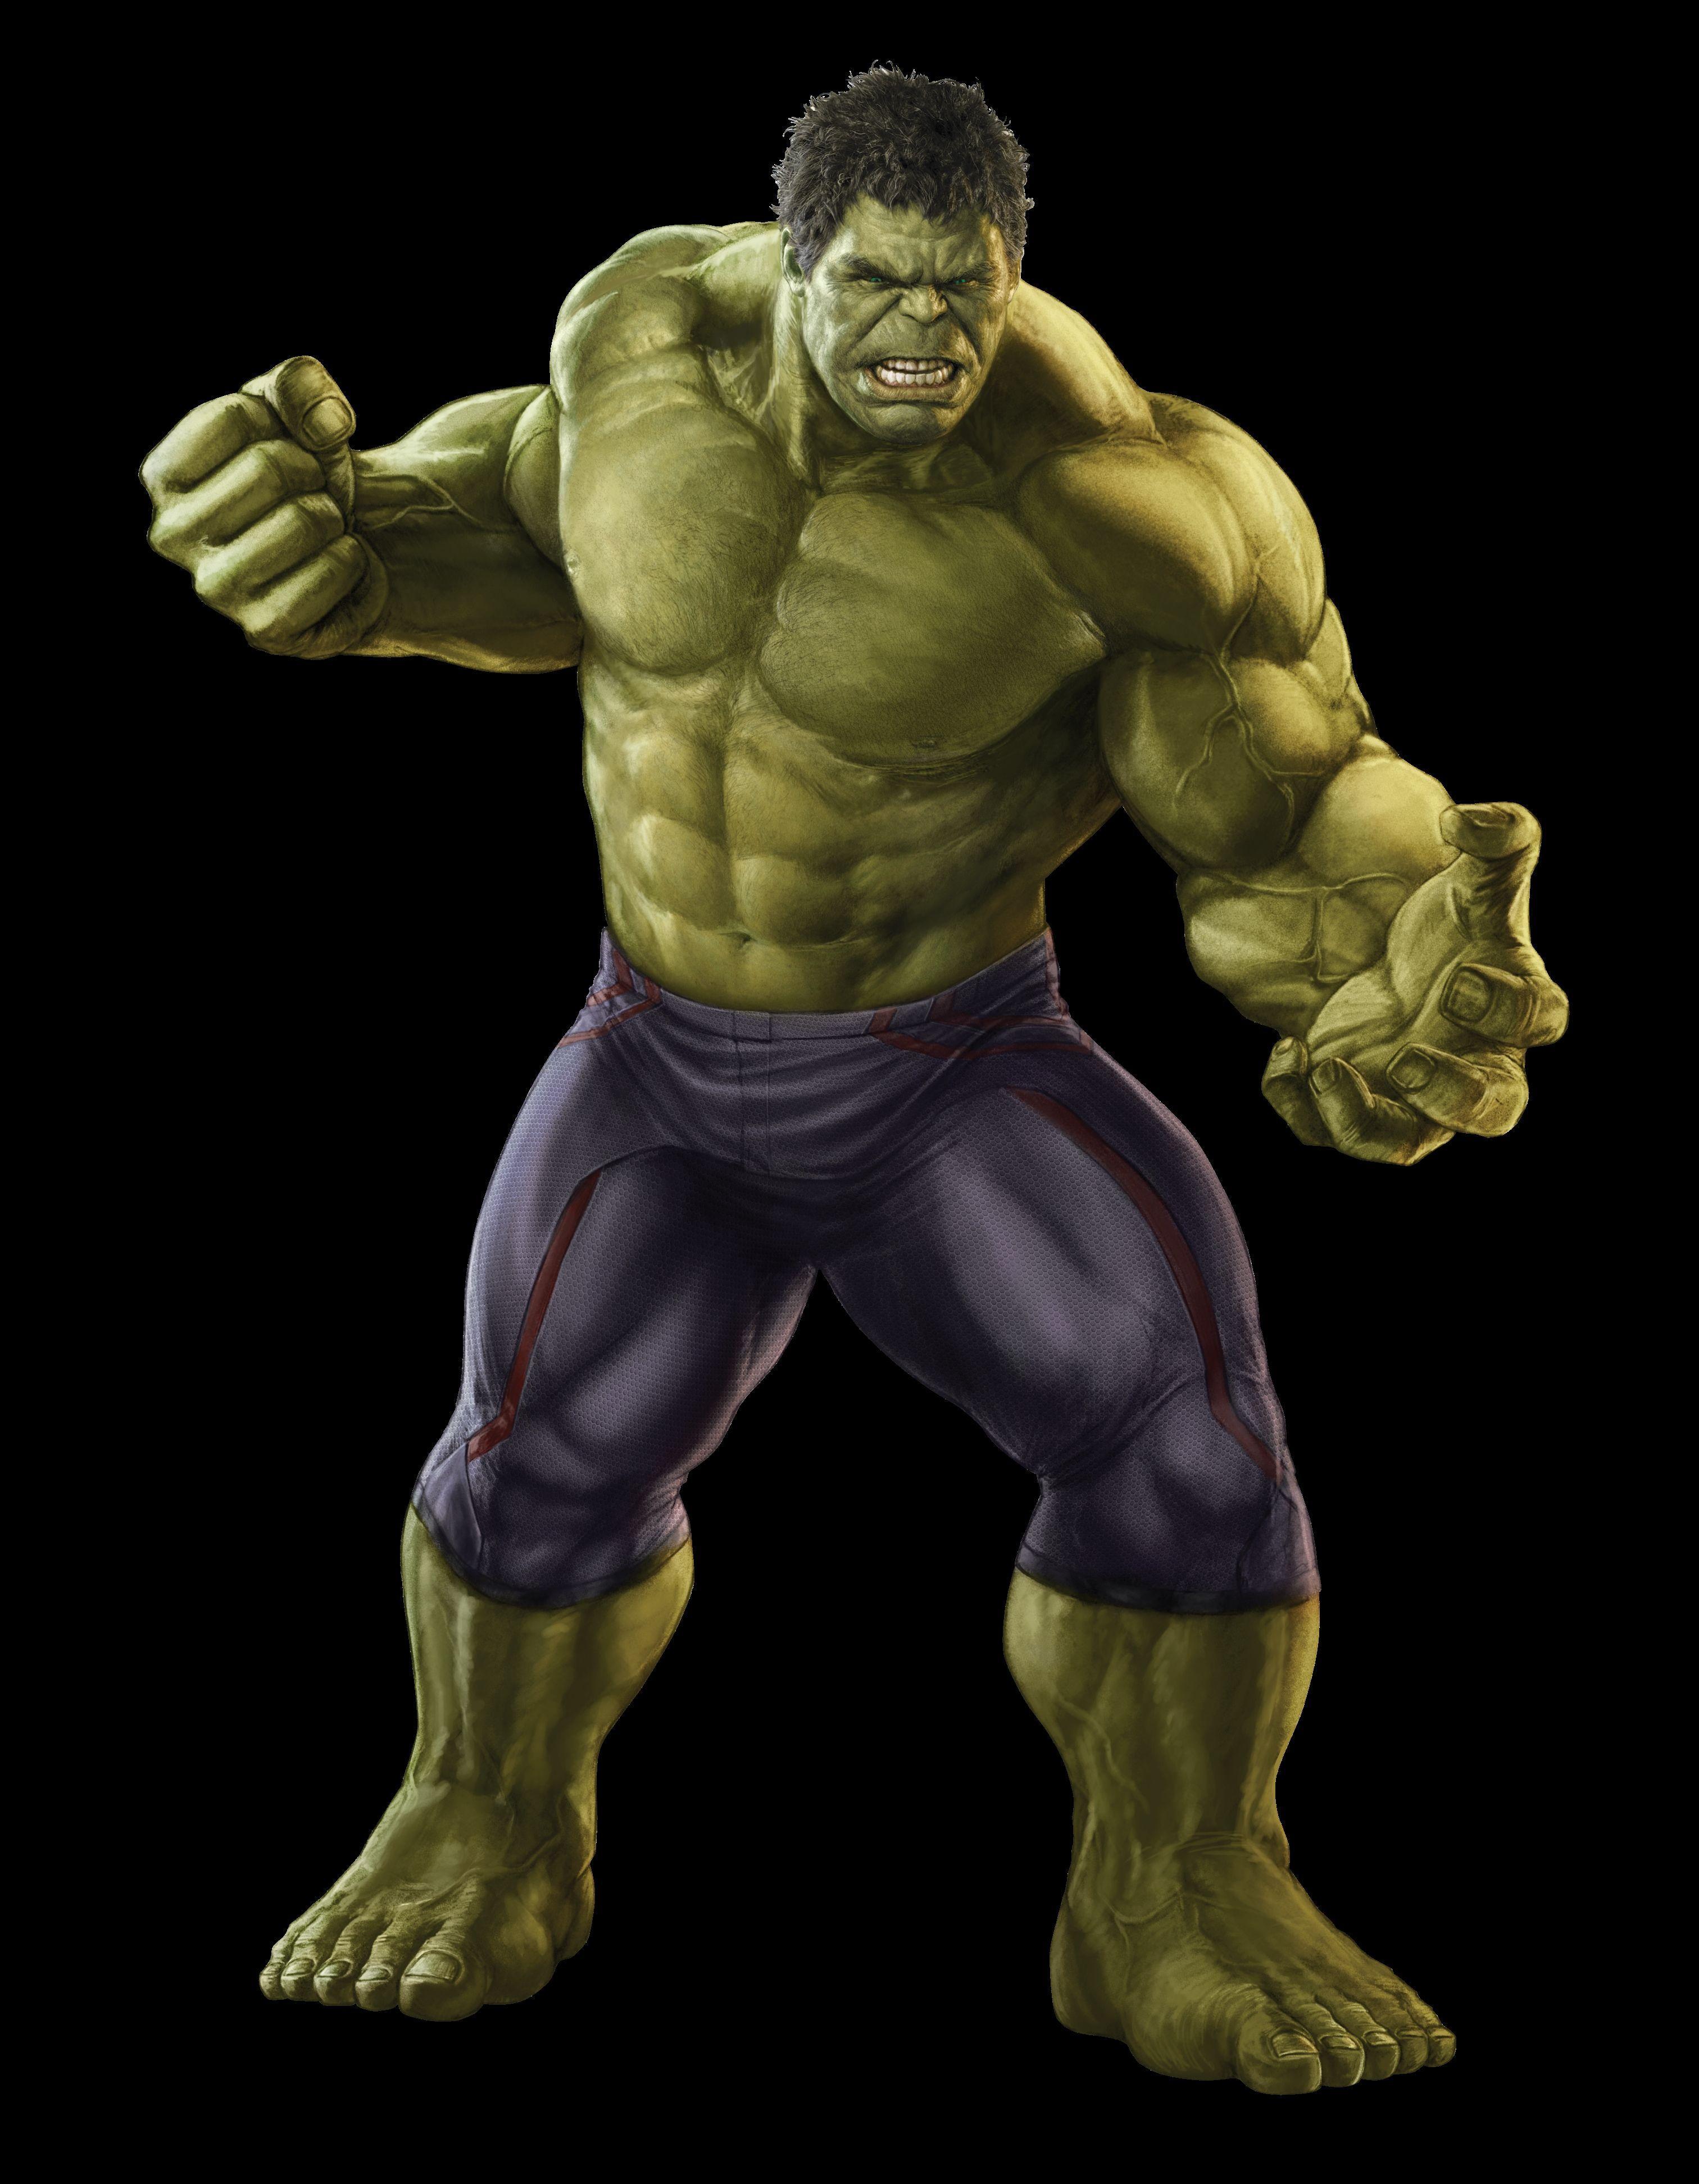 Marvel Heroes Hulk Wallpapers - Wallpaper Cave